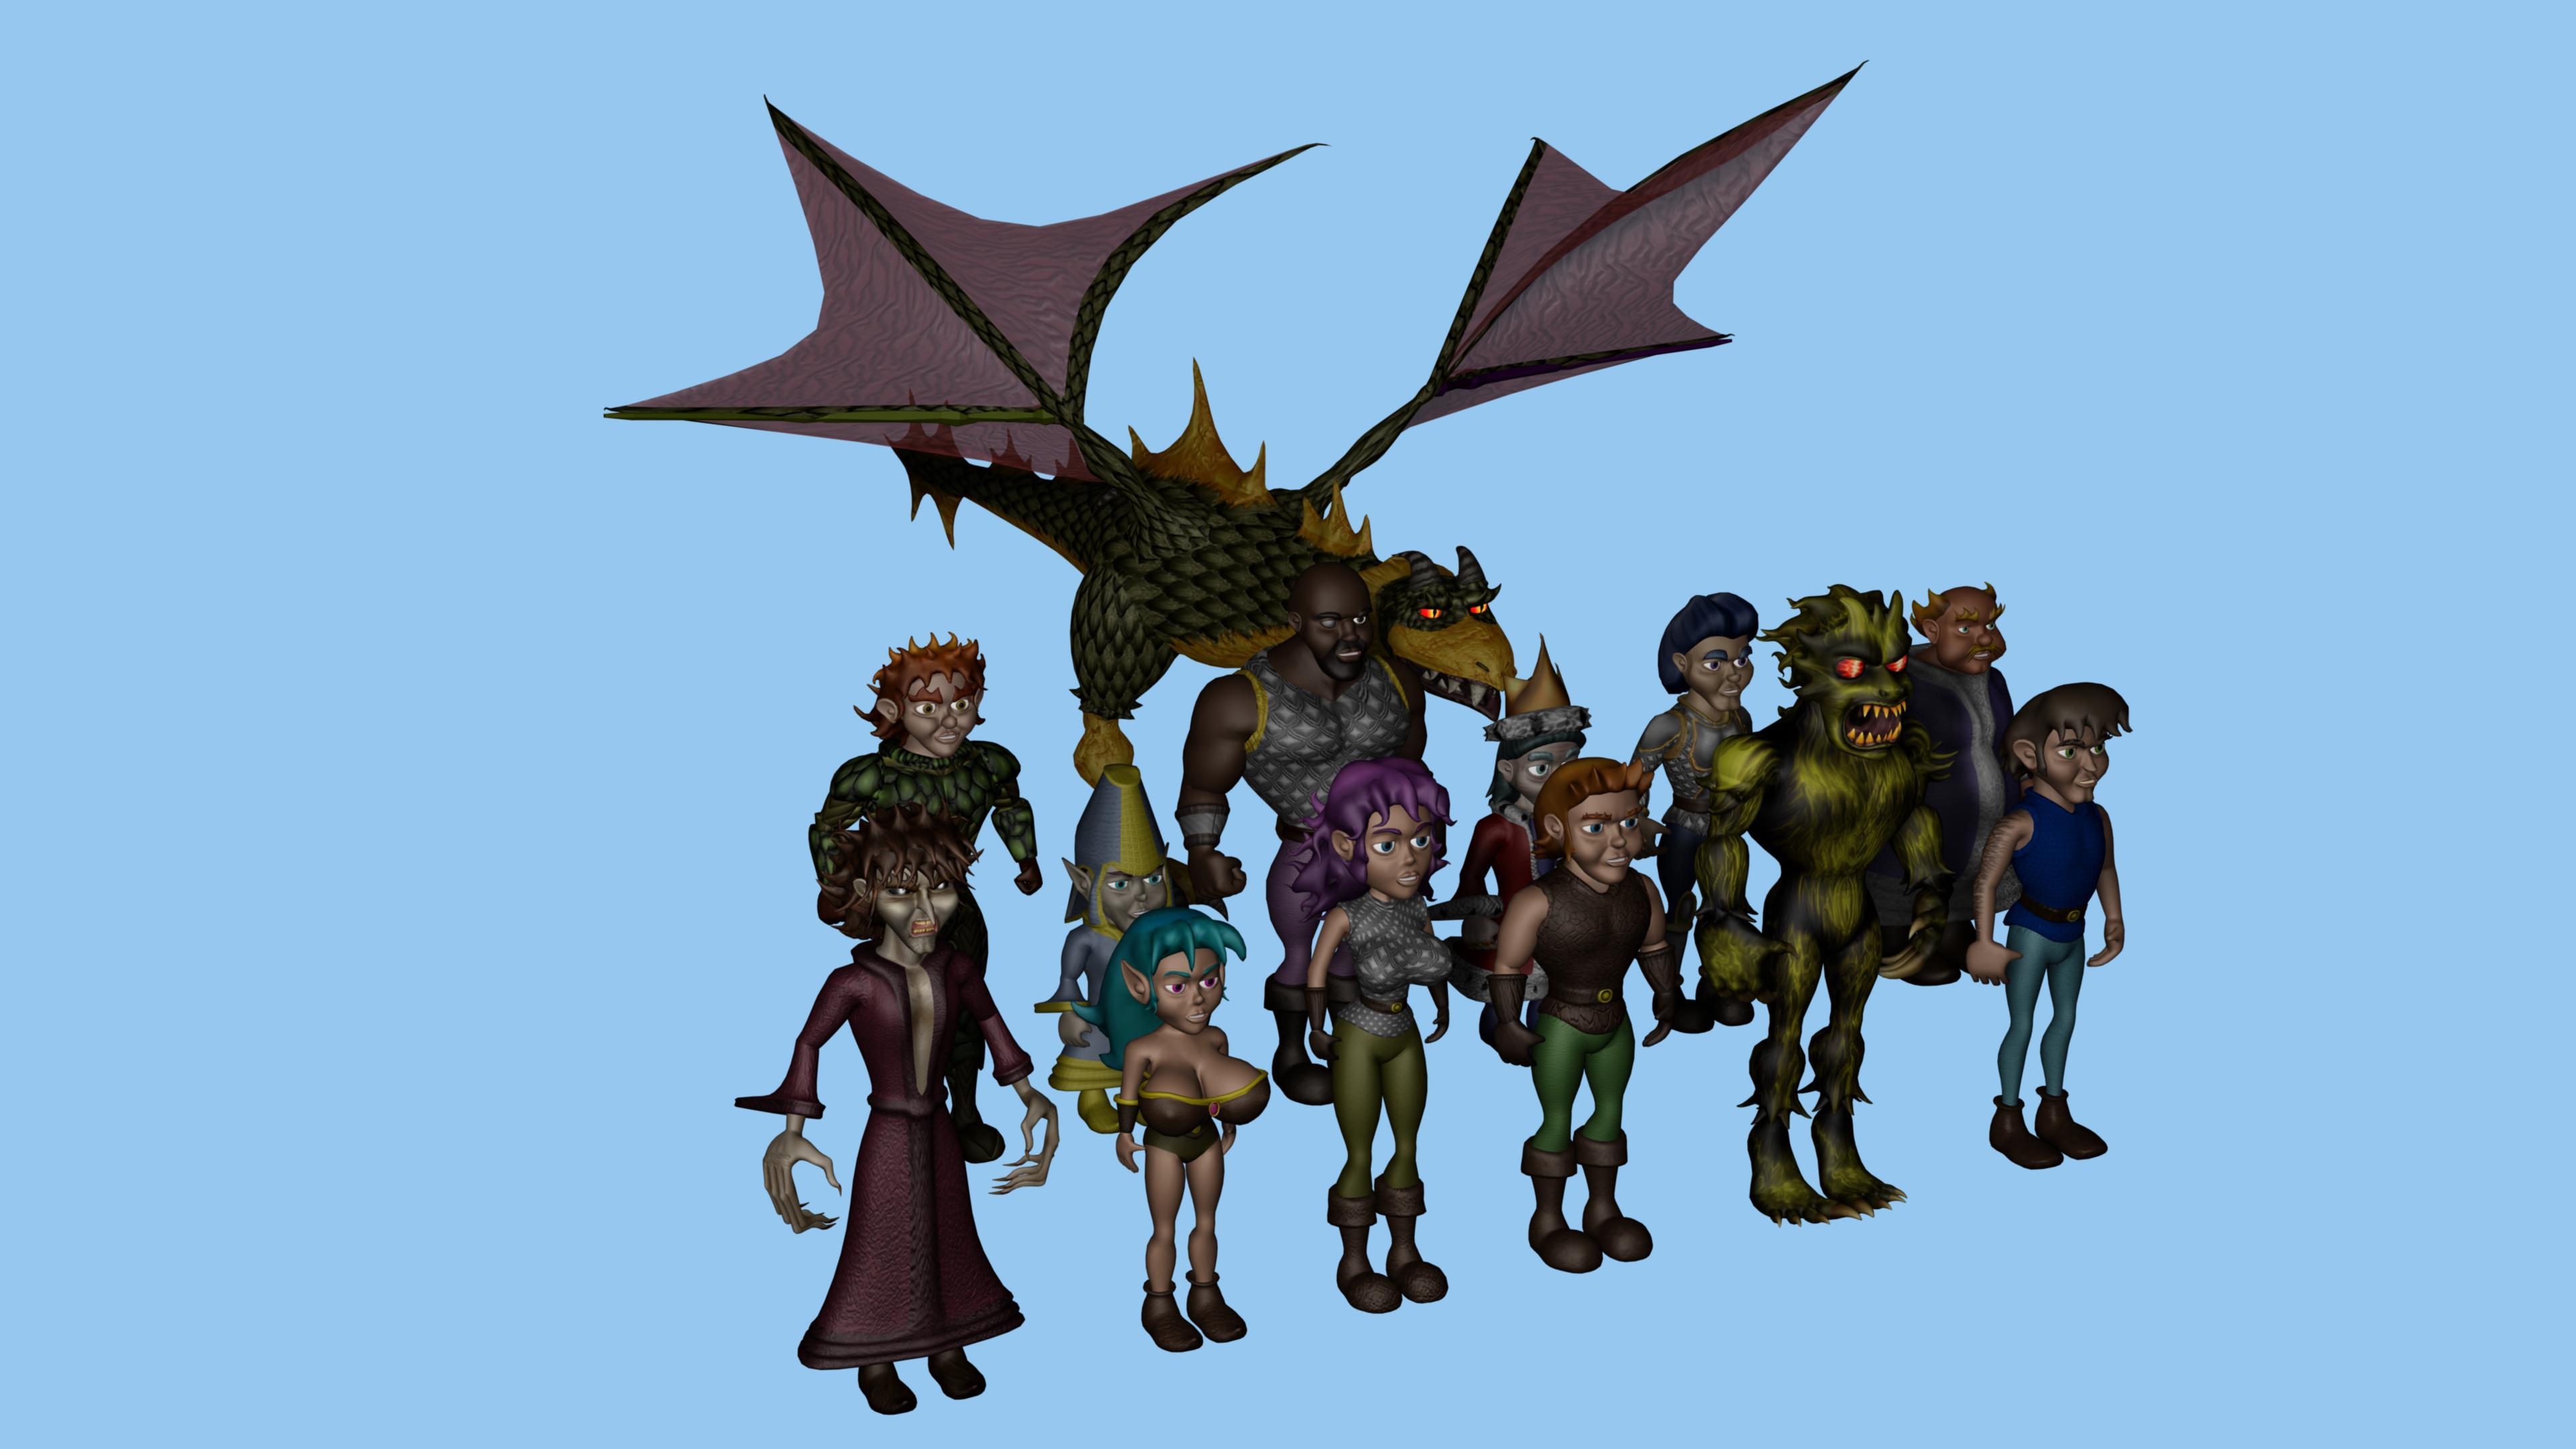 Tales of Adventure cast